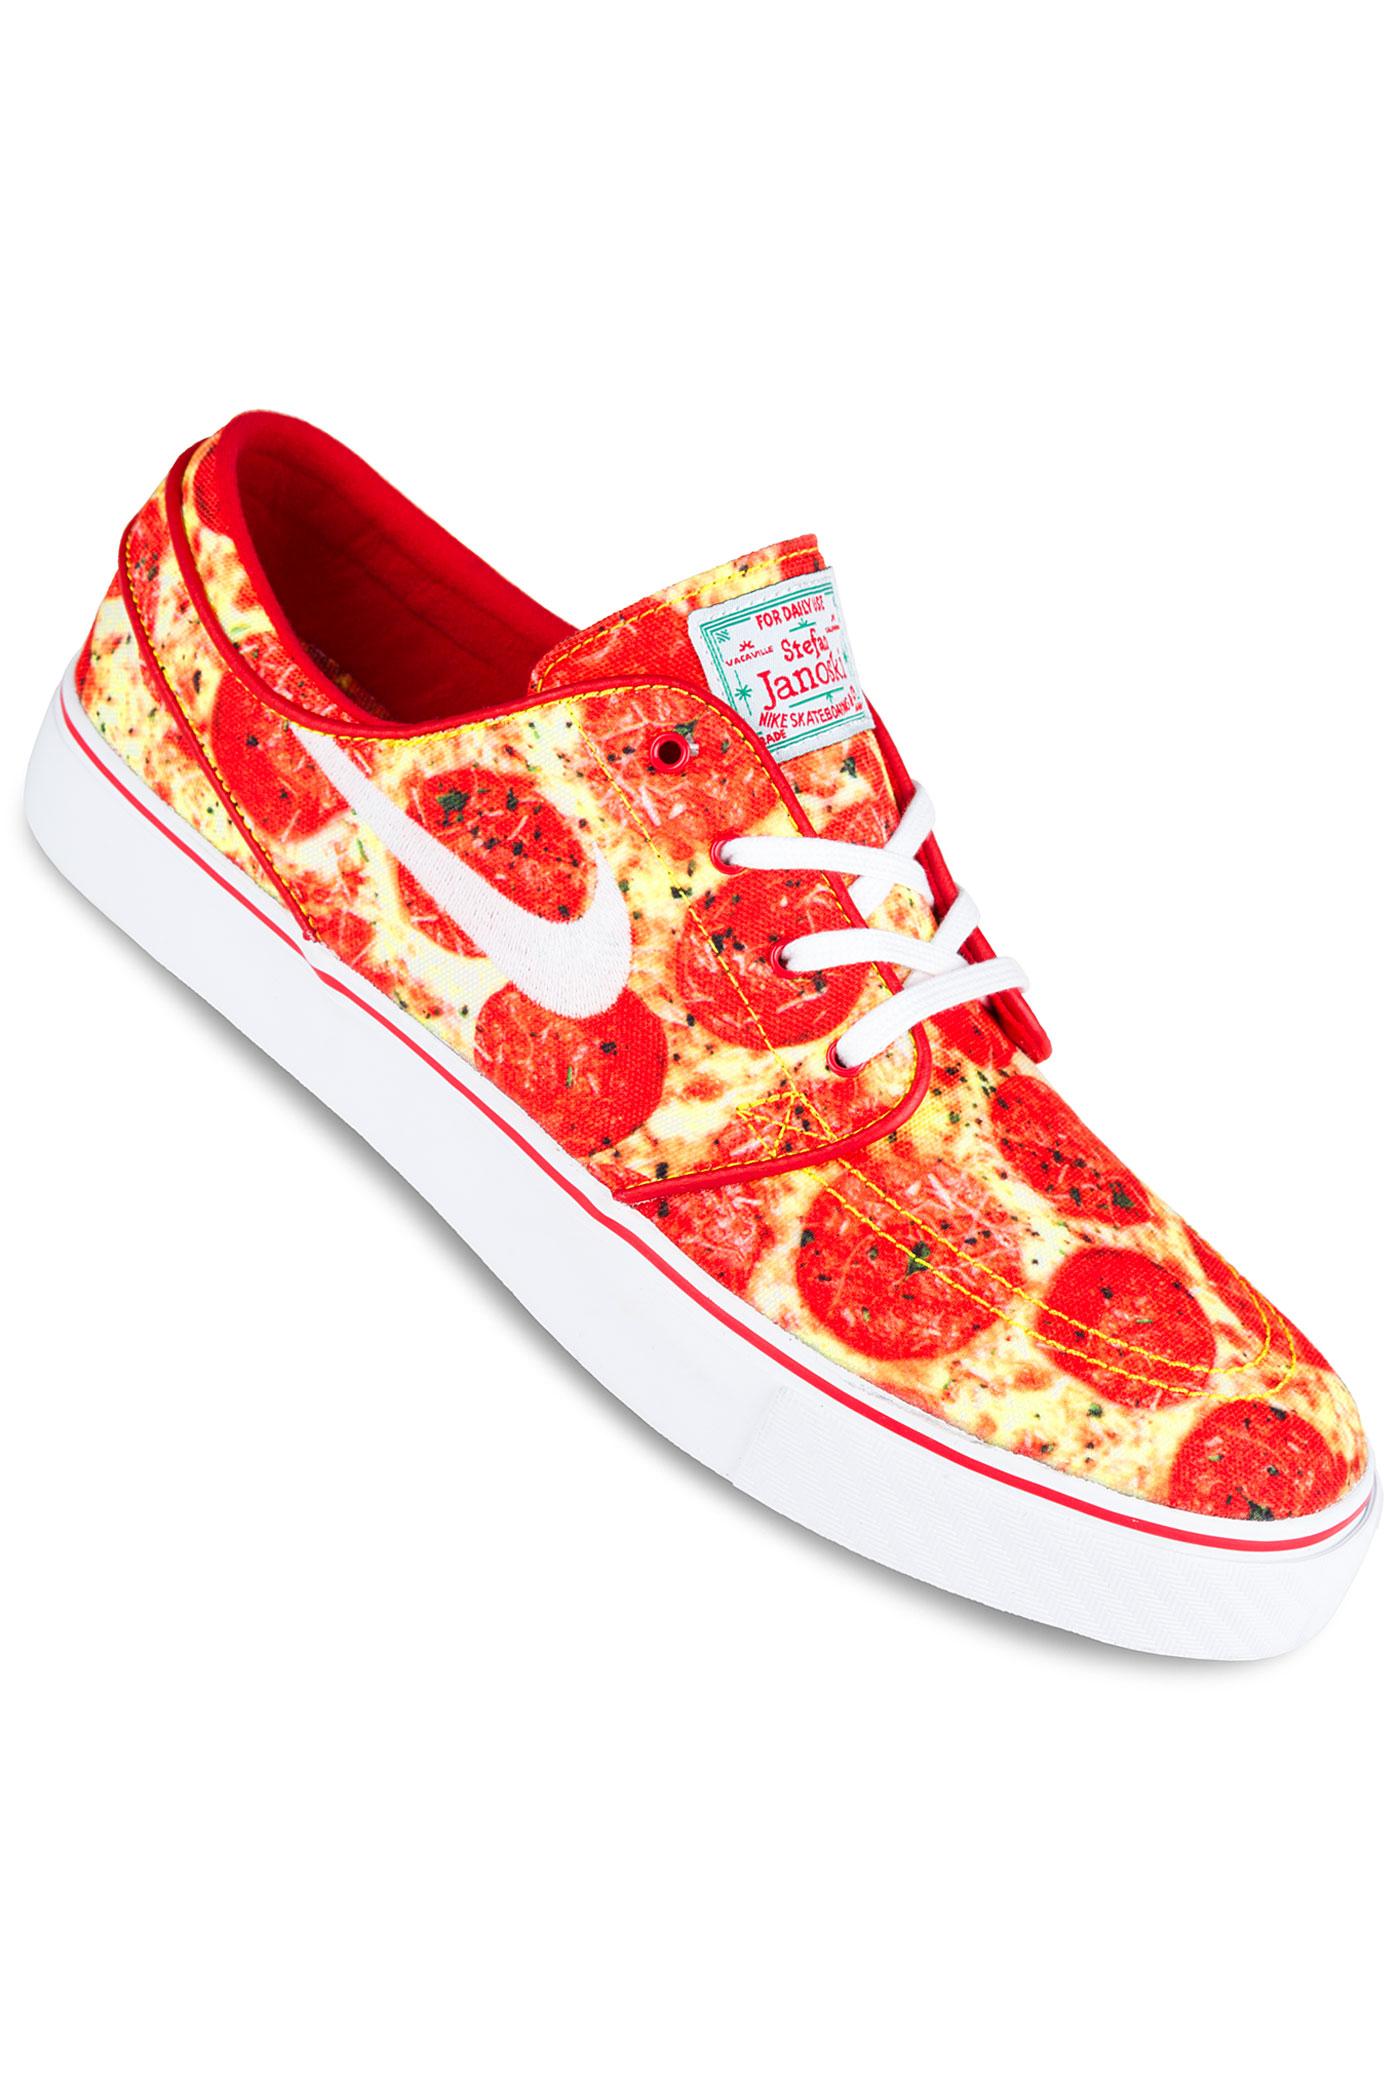 nike sb x skate mental zoom stefan janoski qs chaussure pepperoni pizza achetez sur skatedeluxe. Black Bedroom Furniture Sets. Home Design Ideas